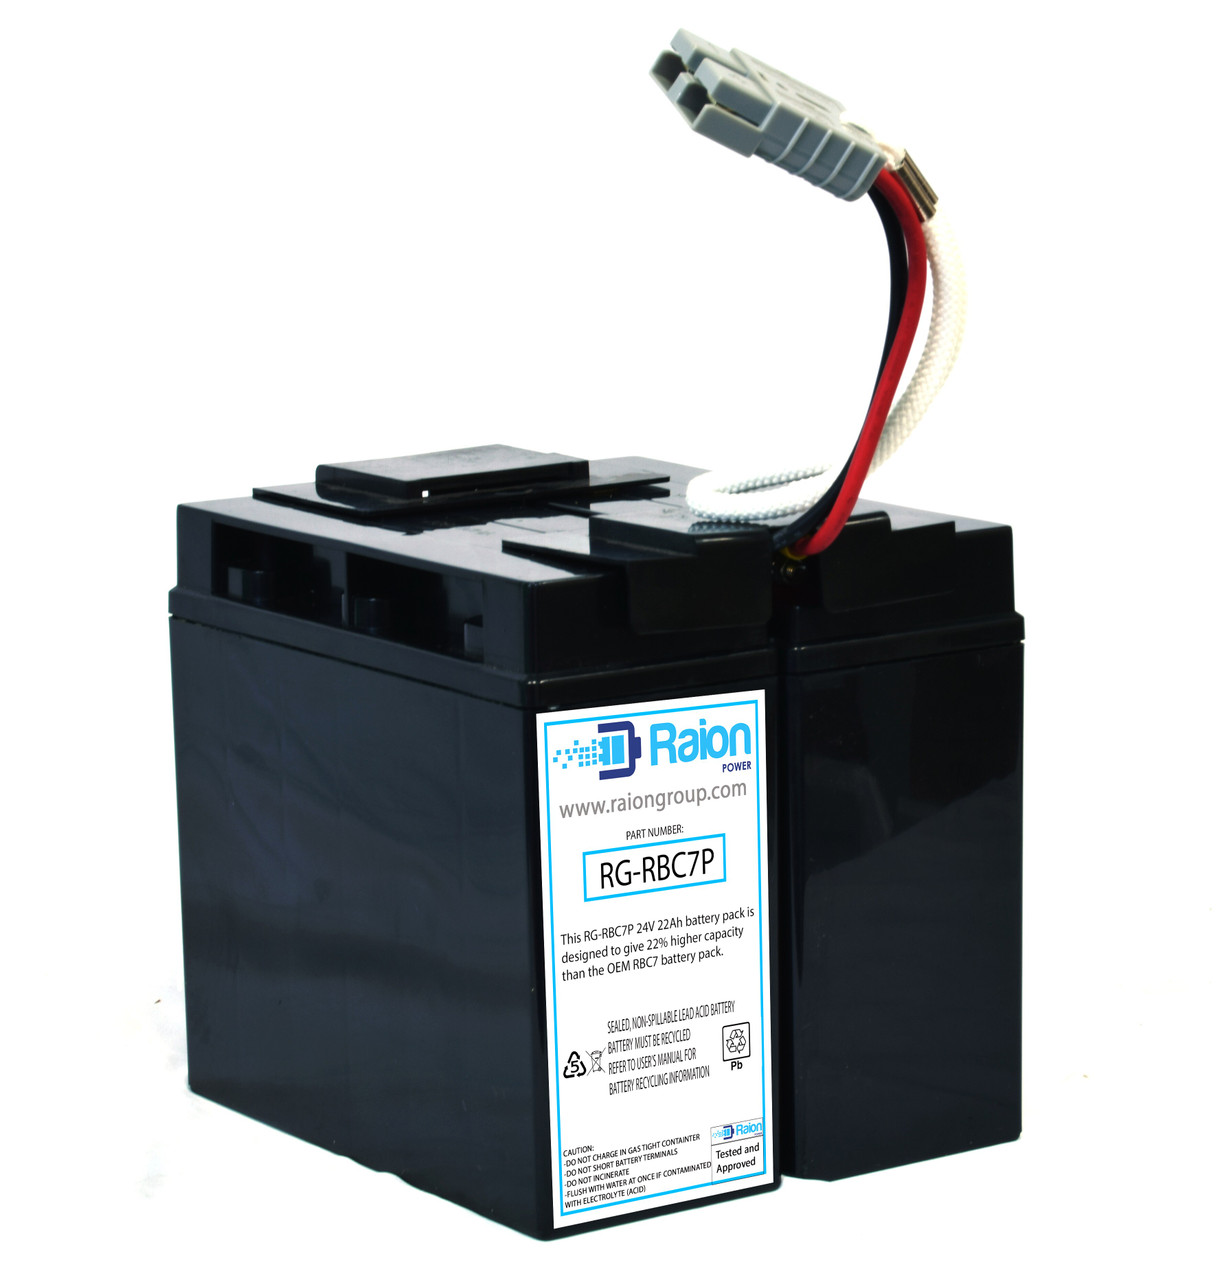 Raion Power RG-RBC7 Plus Replacement Battery Cartridge For APC BackUPS Pro 1400